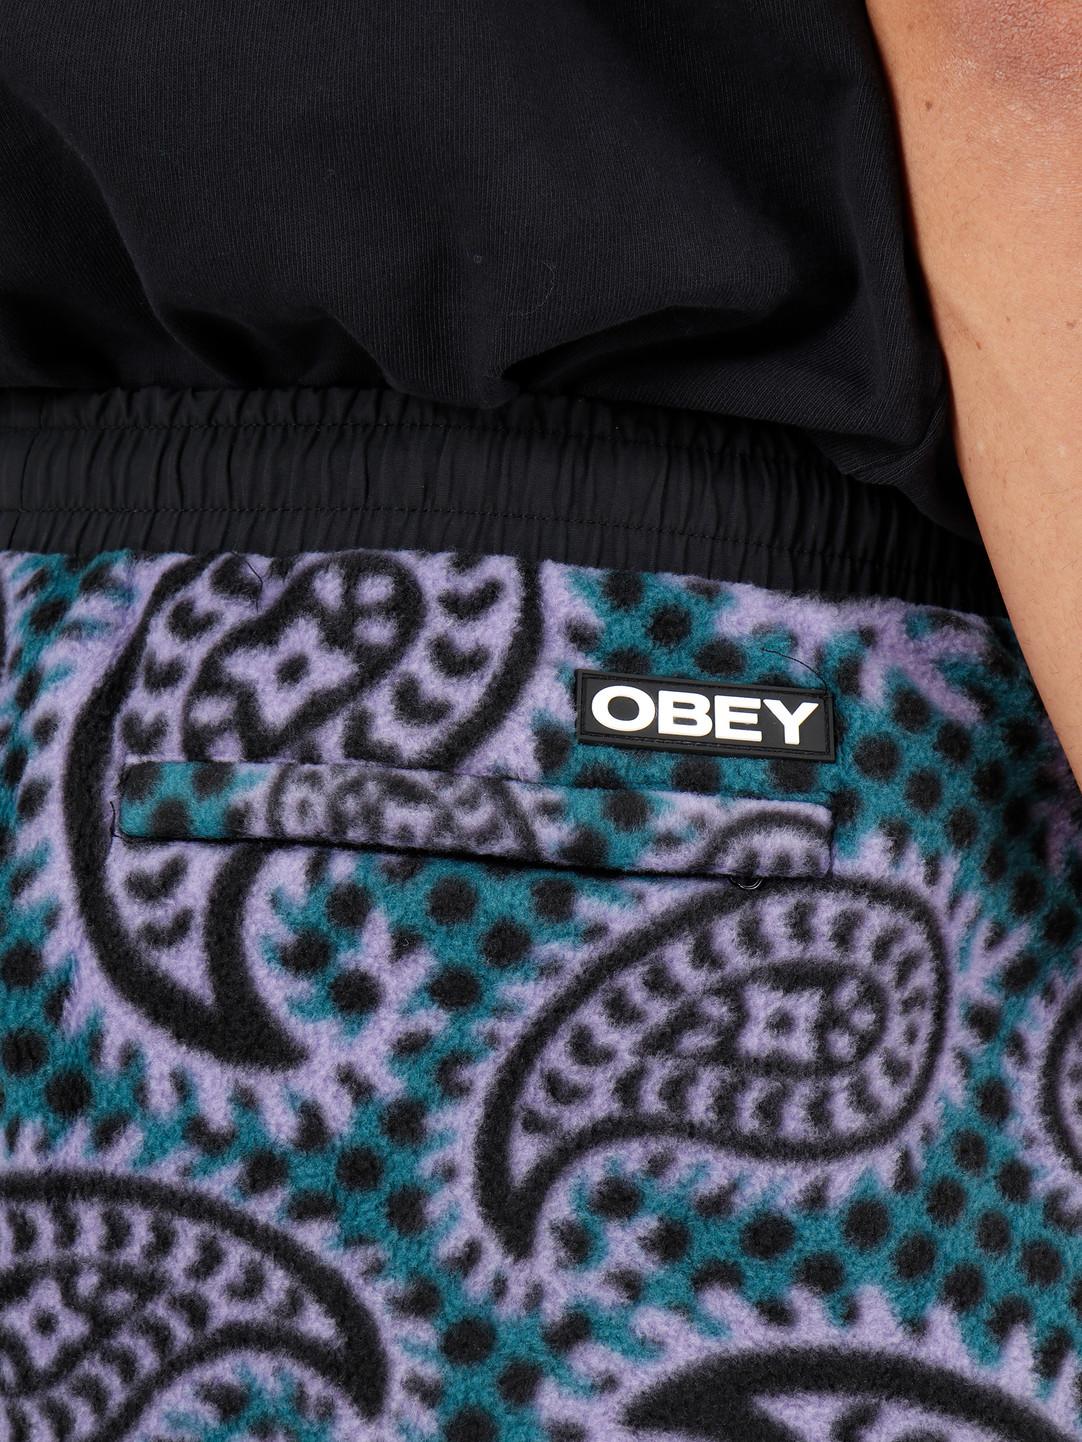 Obey Obey Easy Eisley Pant Paisley Teal 142020145-TEA